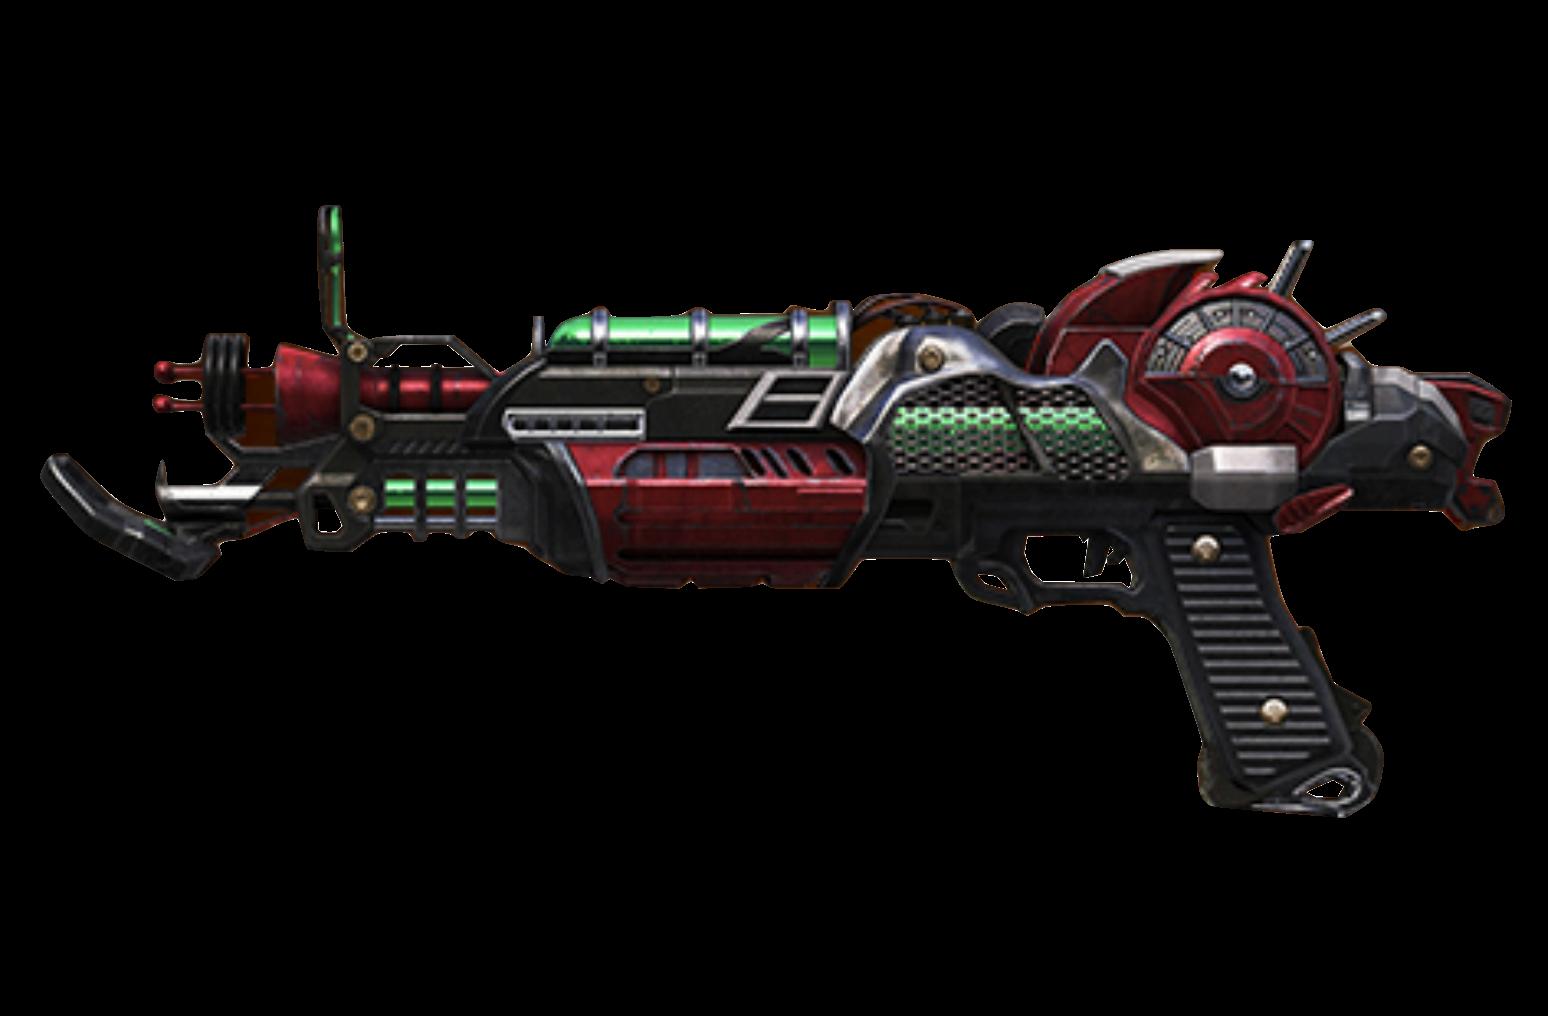 Zombie clipart call duty. Ray gun mark ii